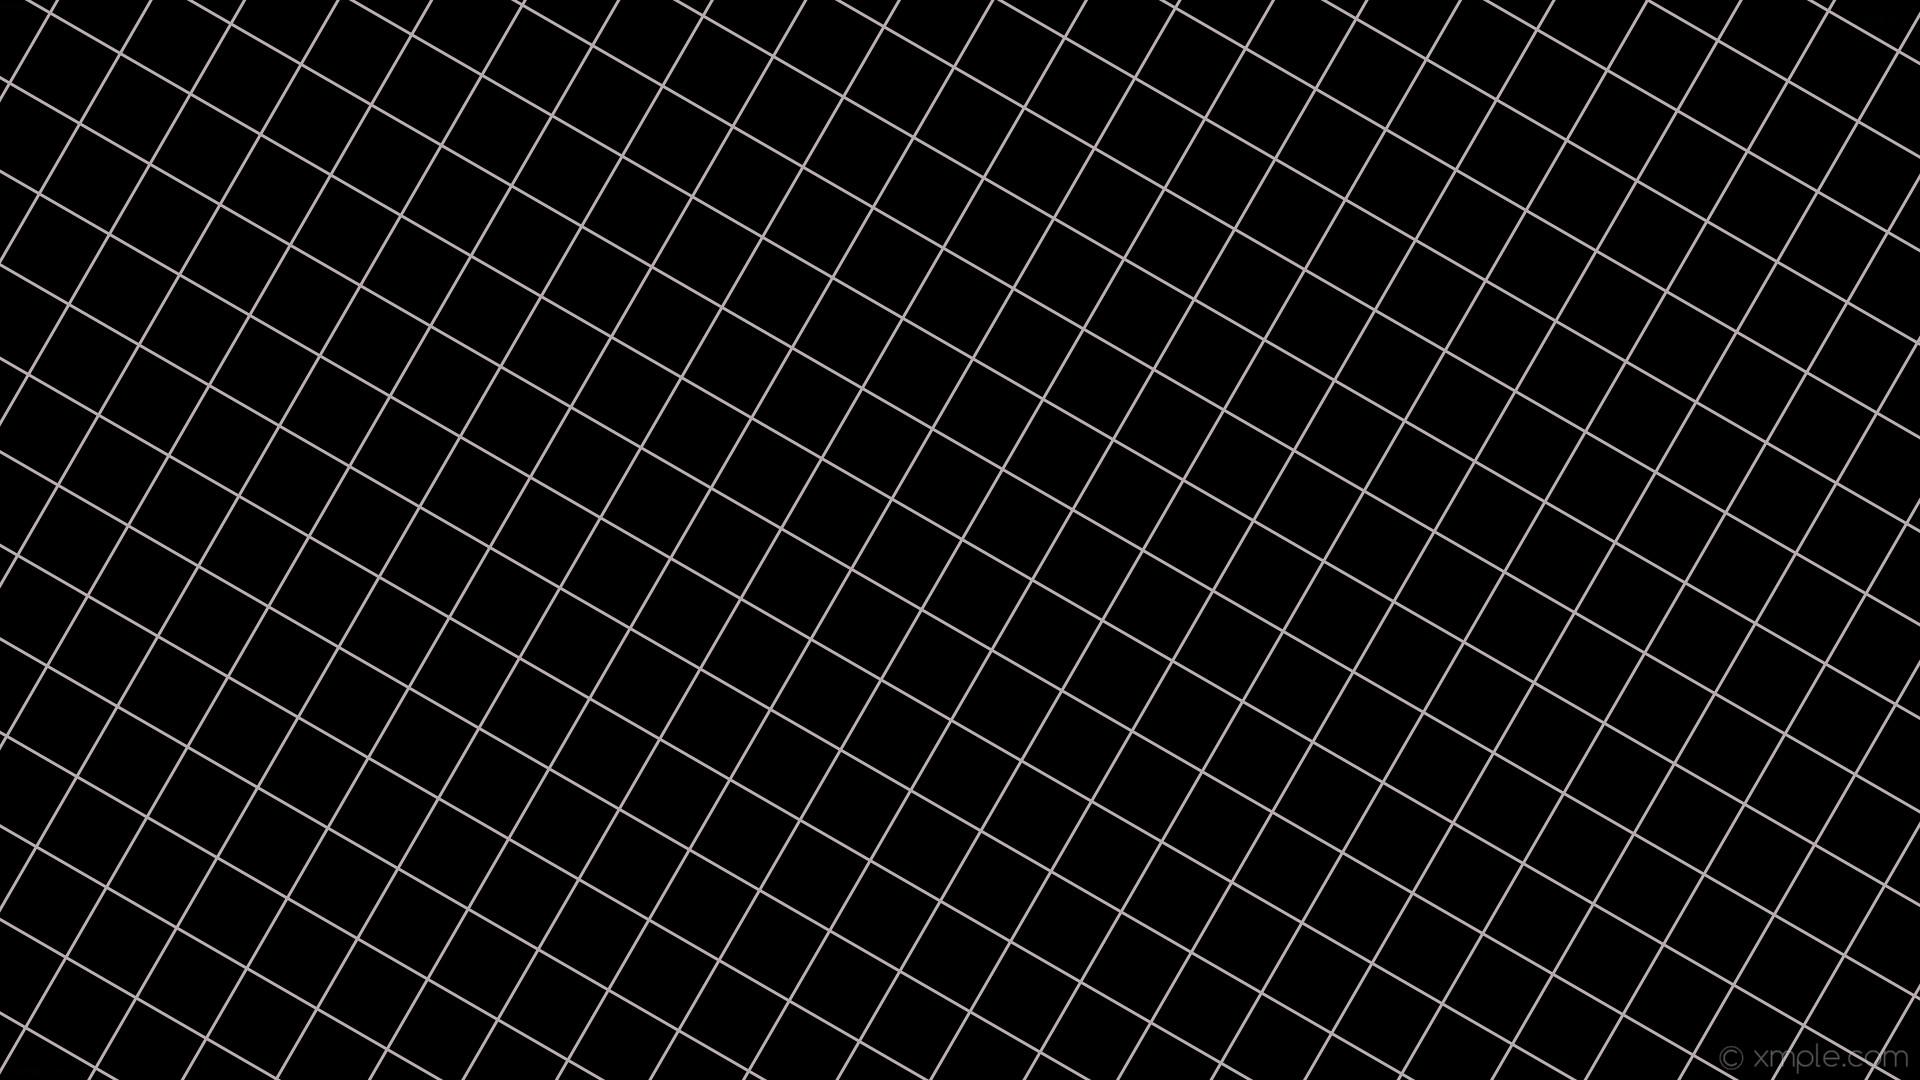 Good Wallpaper Macbook Aesthetic - 1085648-grid-wallpaper-1920x1080-macbook  Picture_543897.jpg